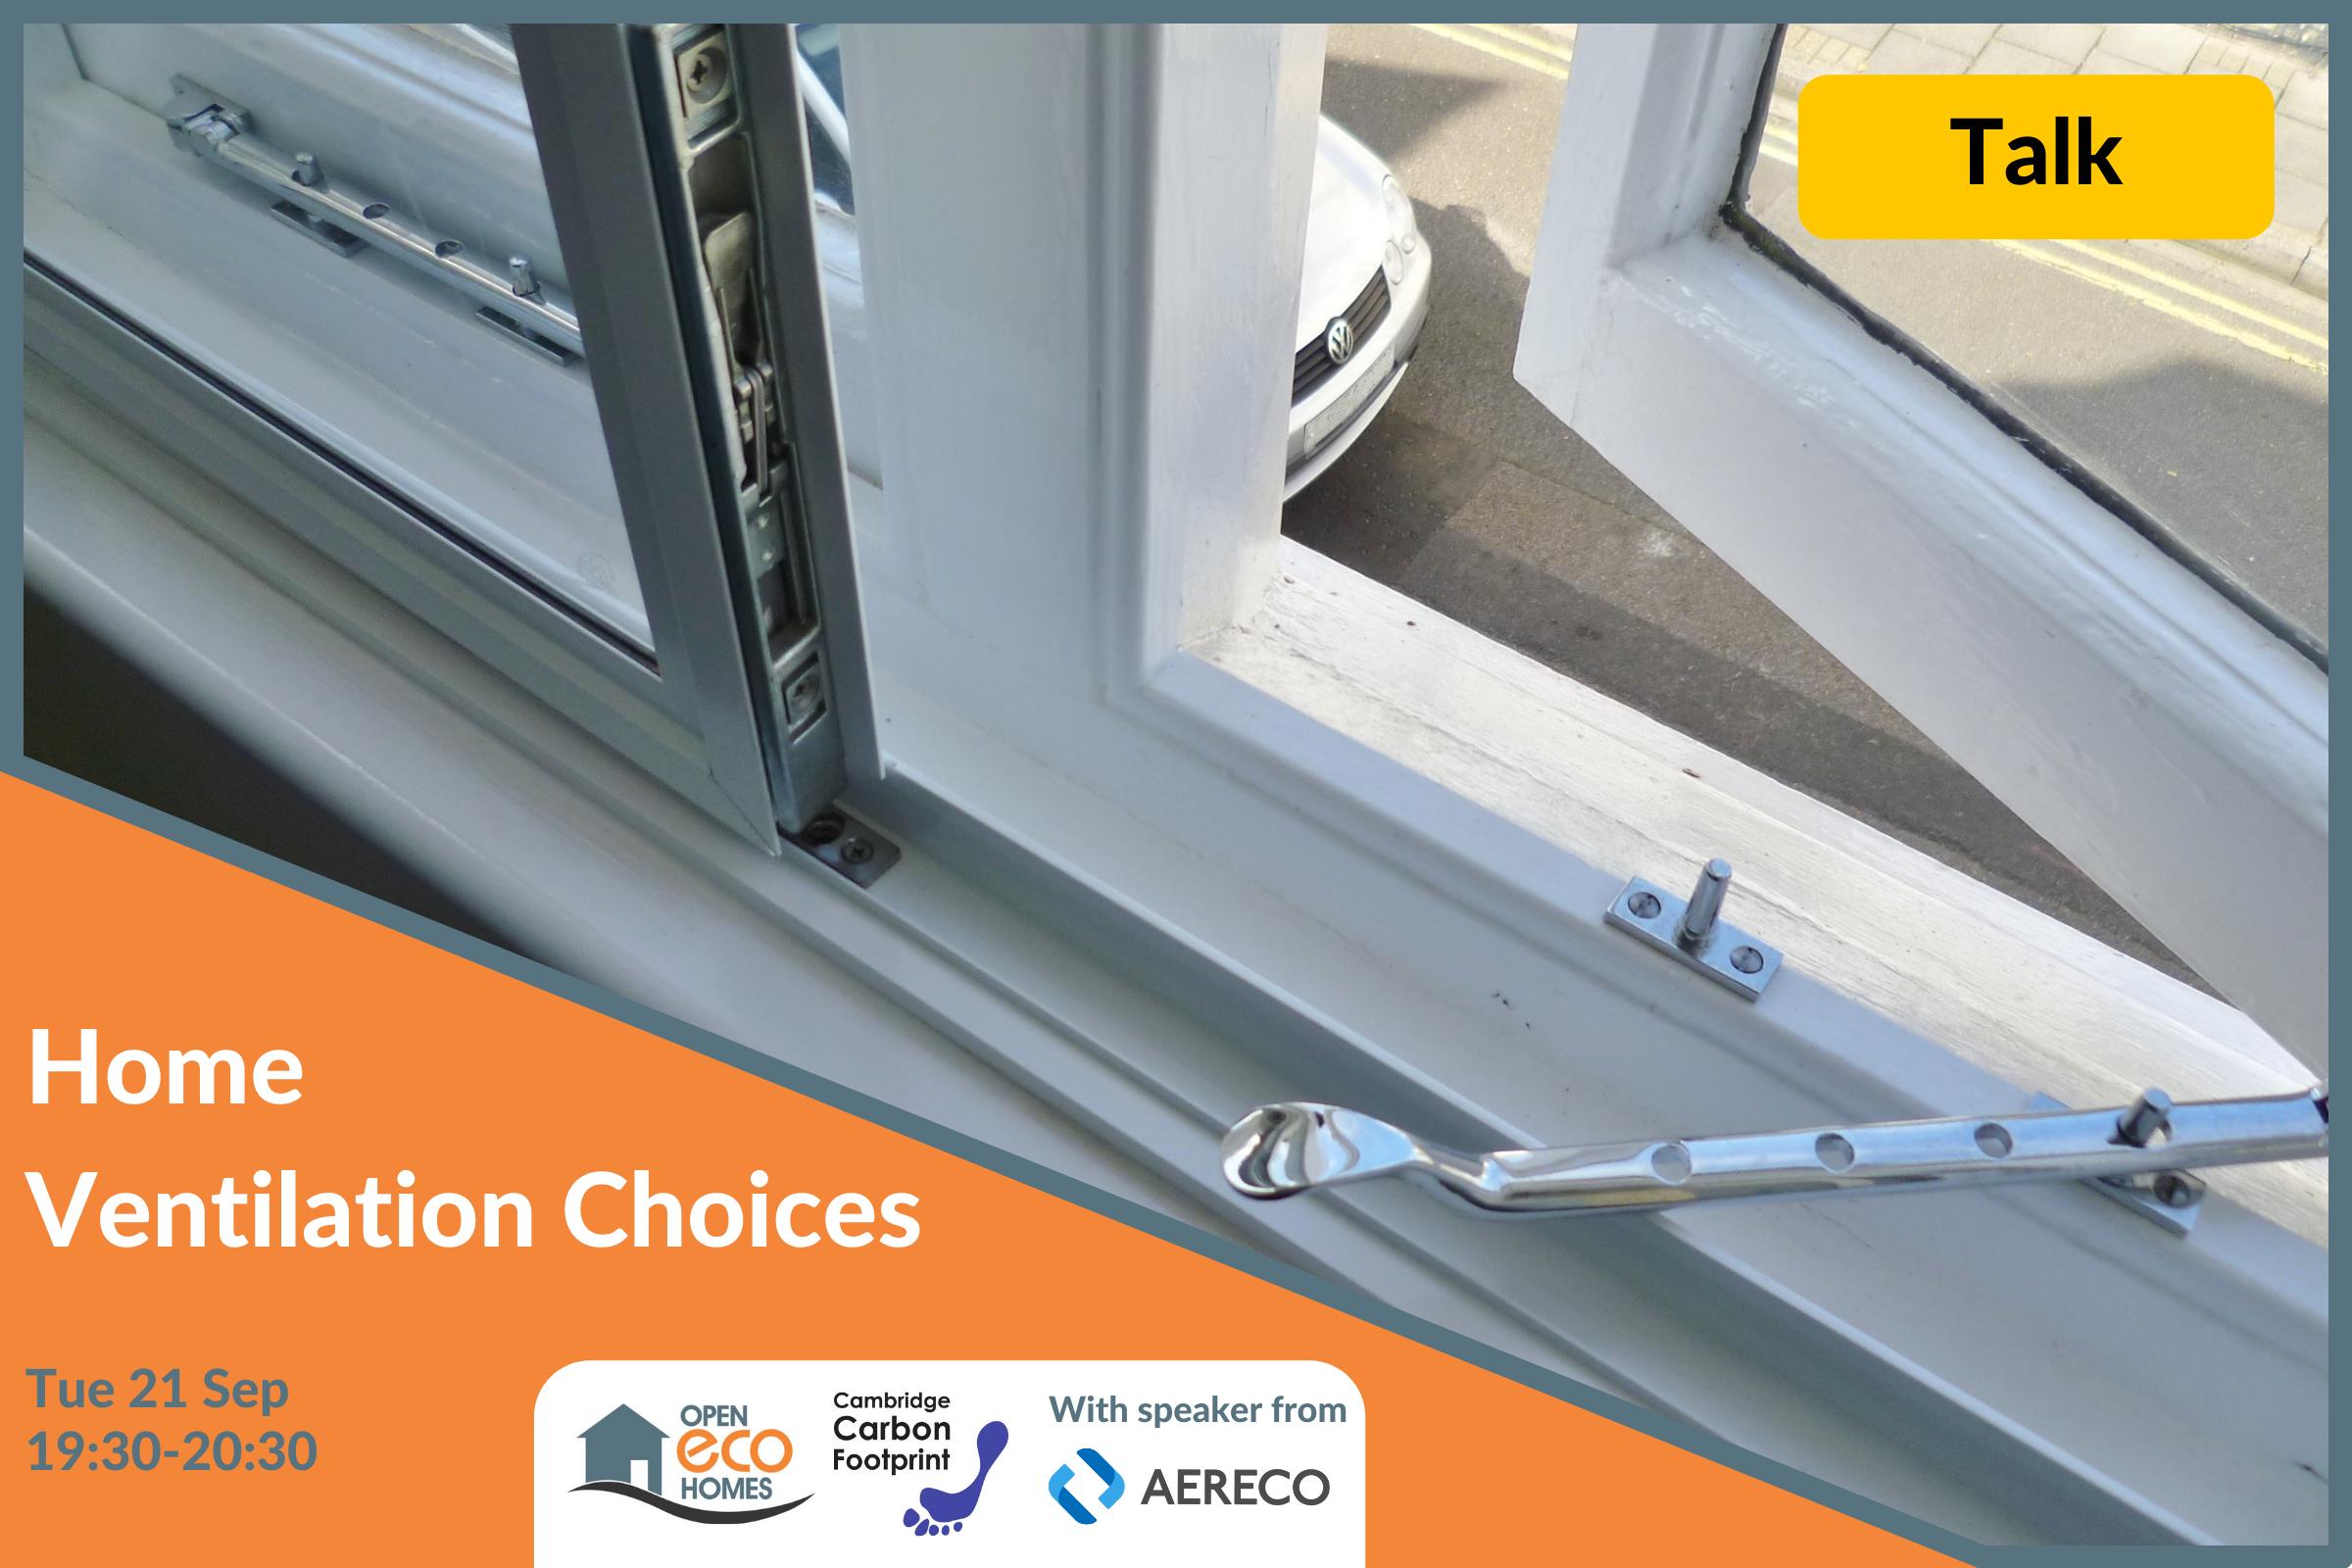 Home Ventilation Choices